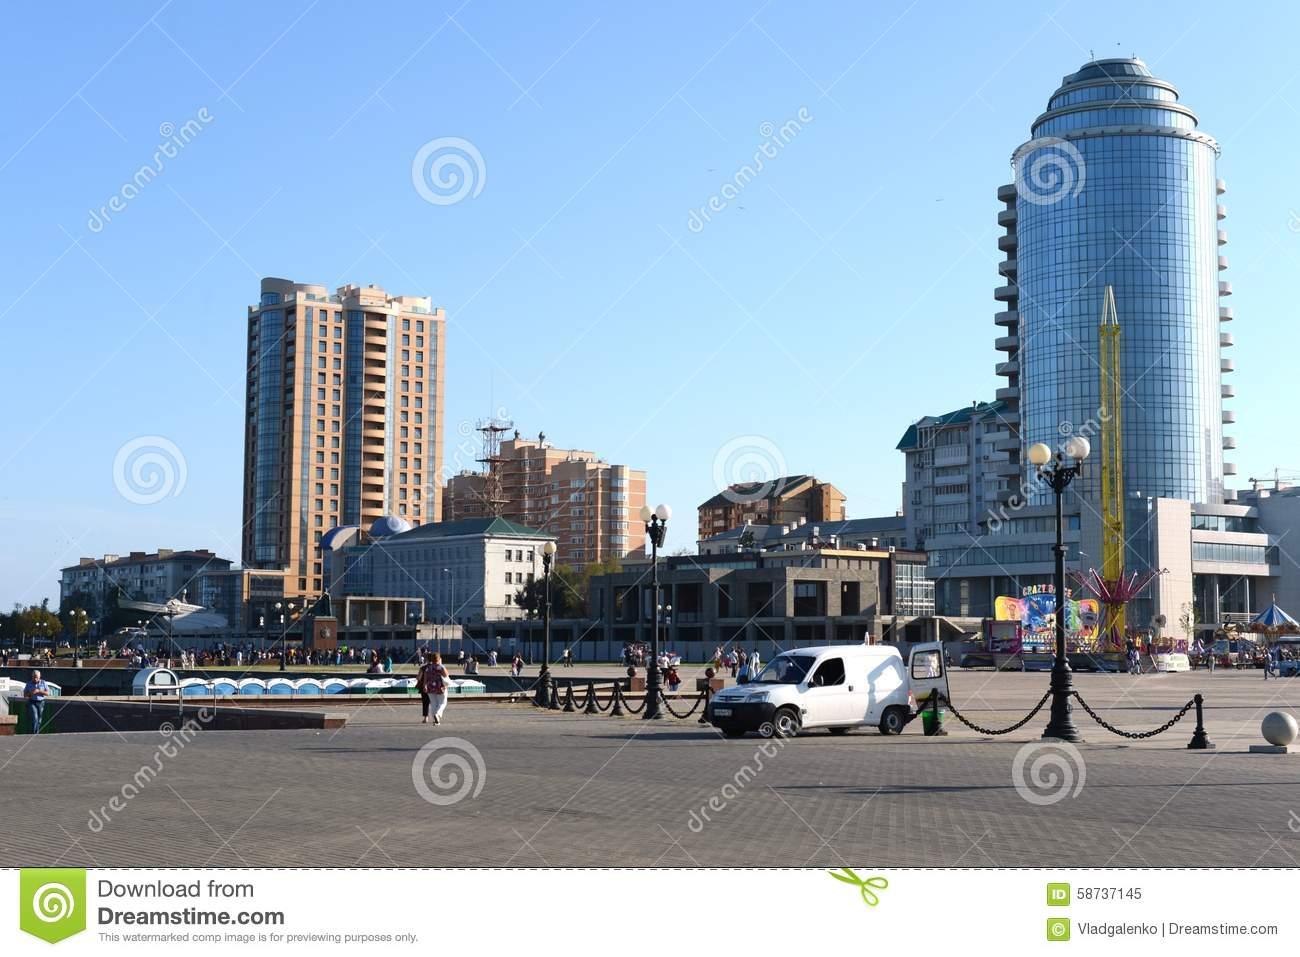 Novorossiysk Is A City On The Coast Tsemess Bay Of The Black Sea.